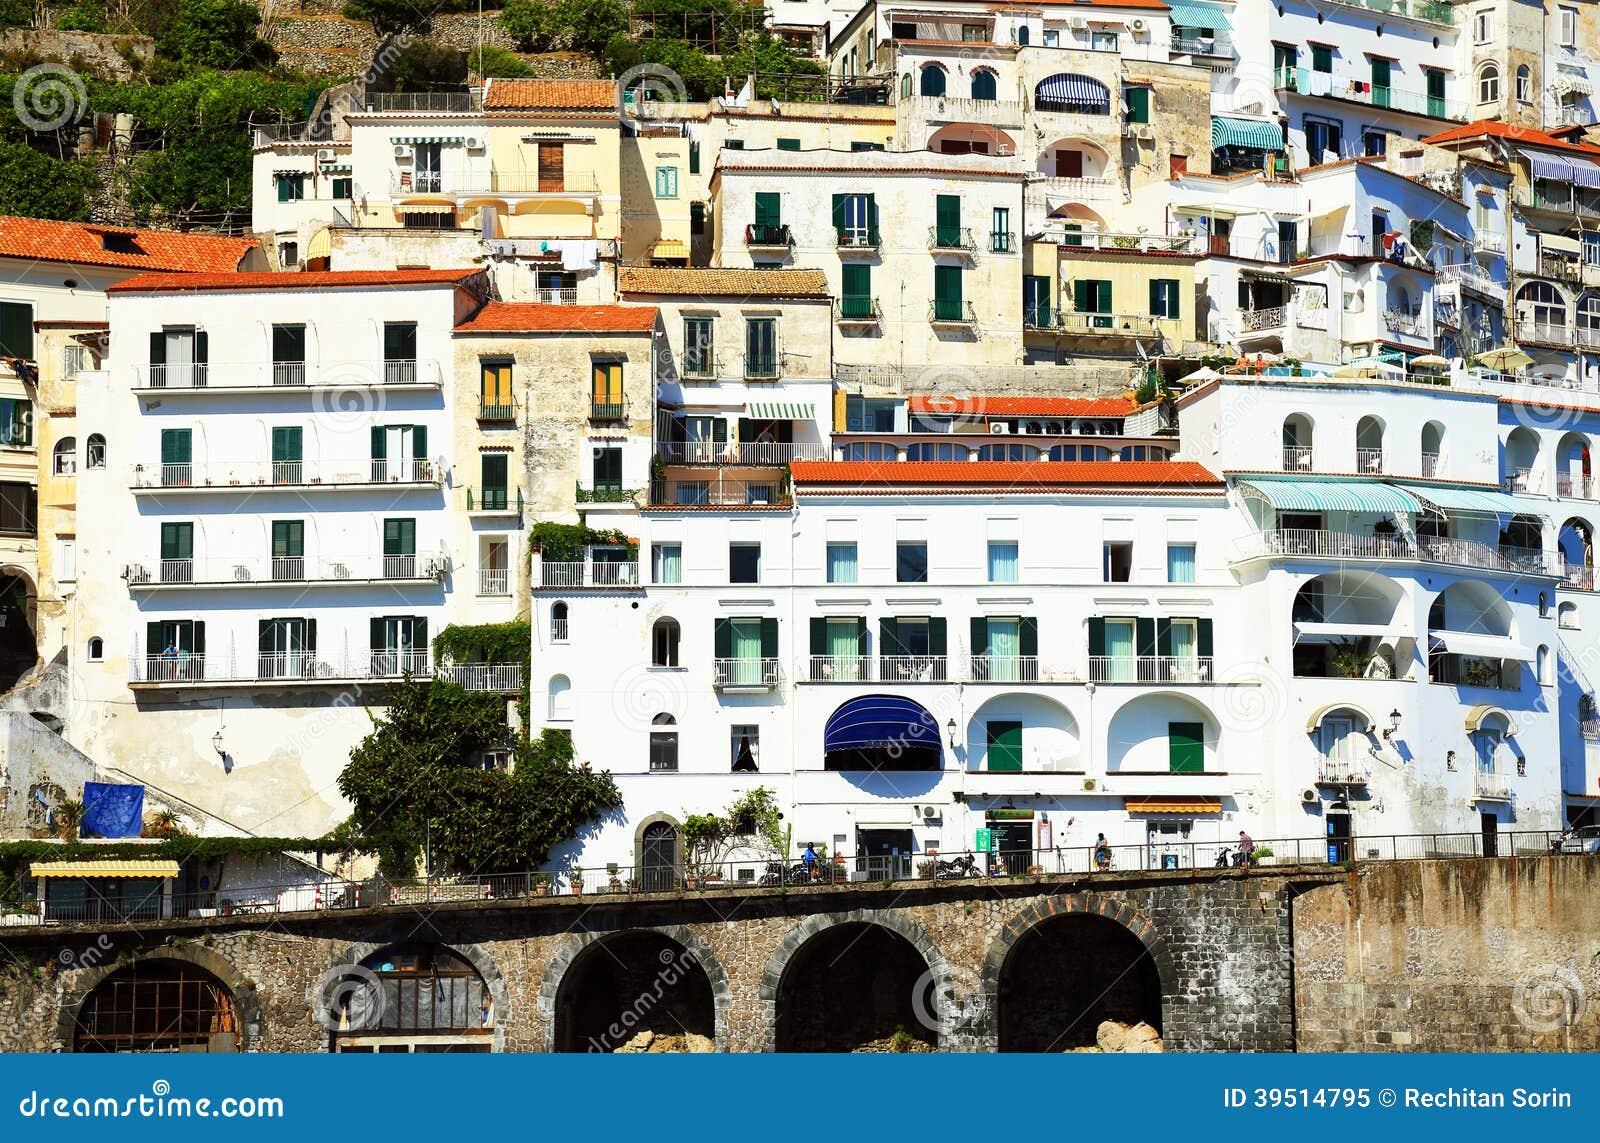 Amalfi Resort, Campania, Italy